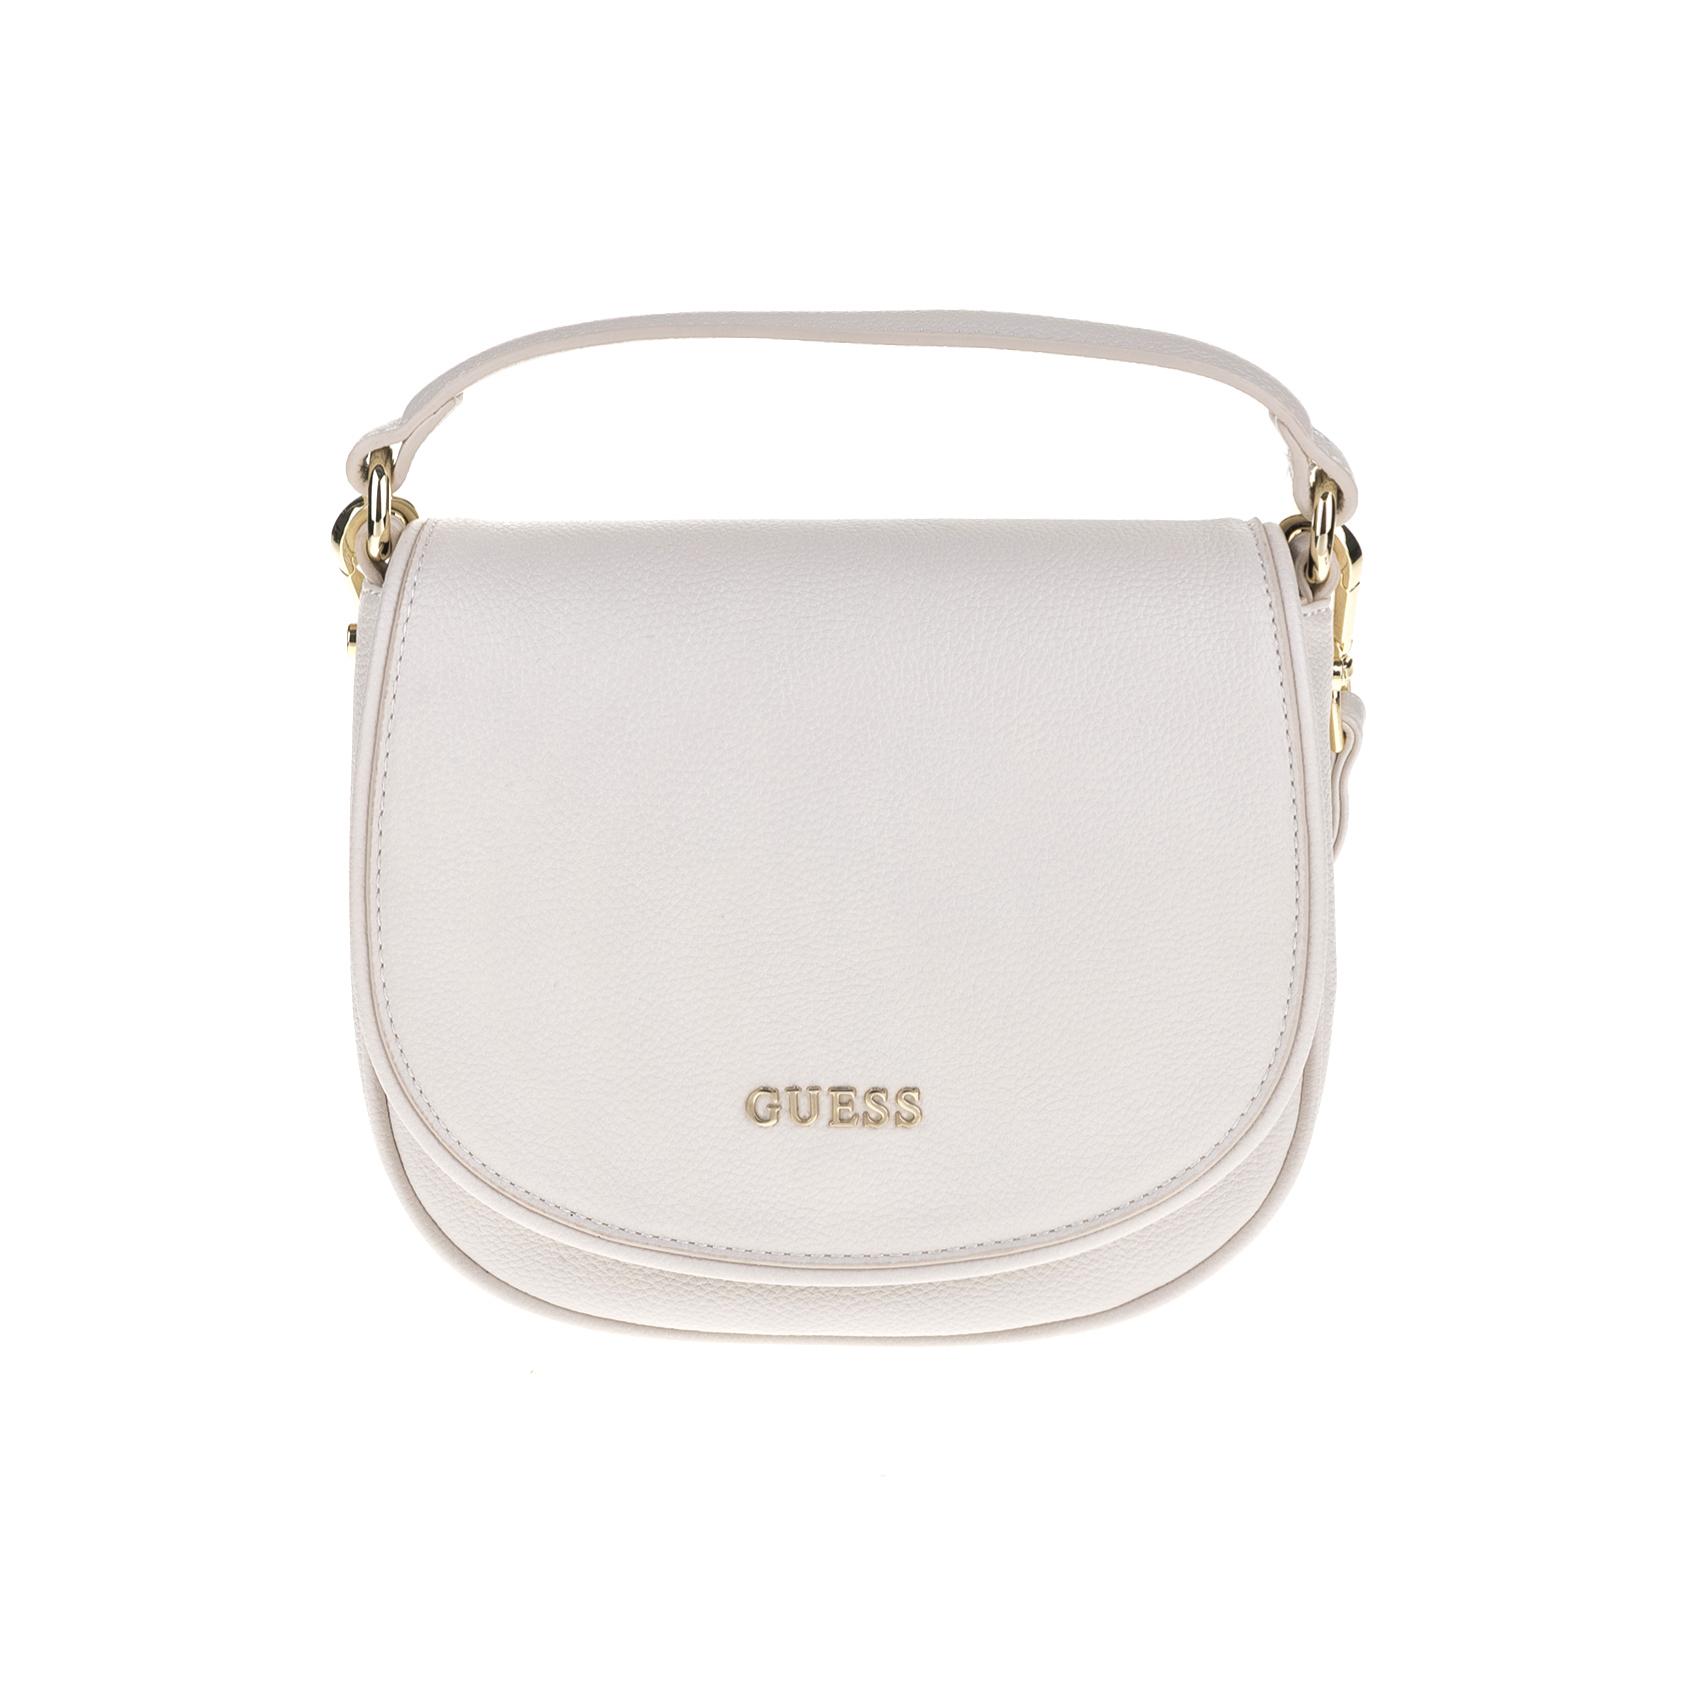 GUESS – Γυναικεία τσάντα SUN DRAWSTRING λευκή 1525808.0-0091